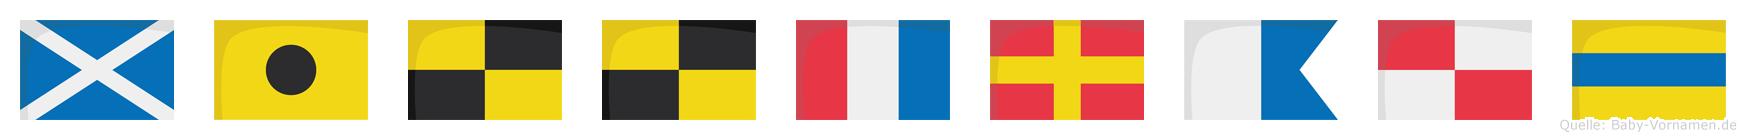 Milltraud im Flaggenalphabet